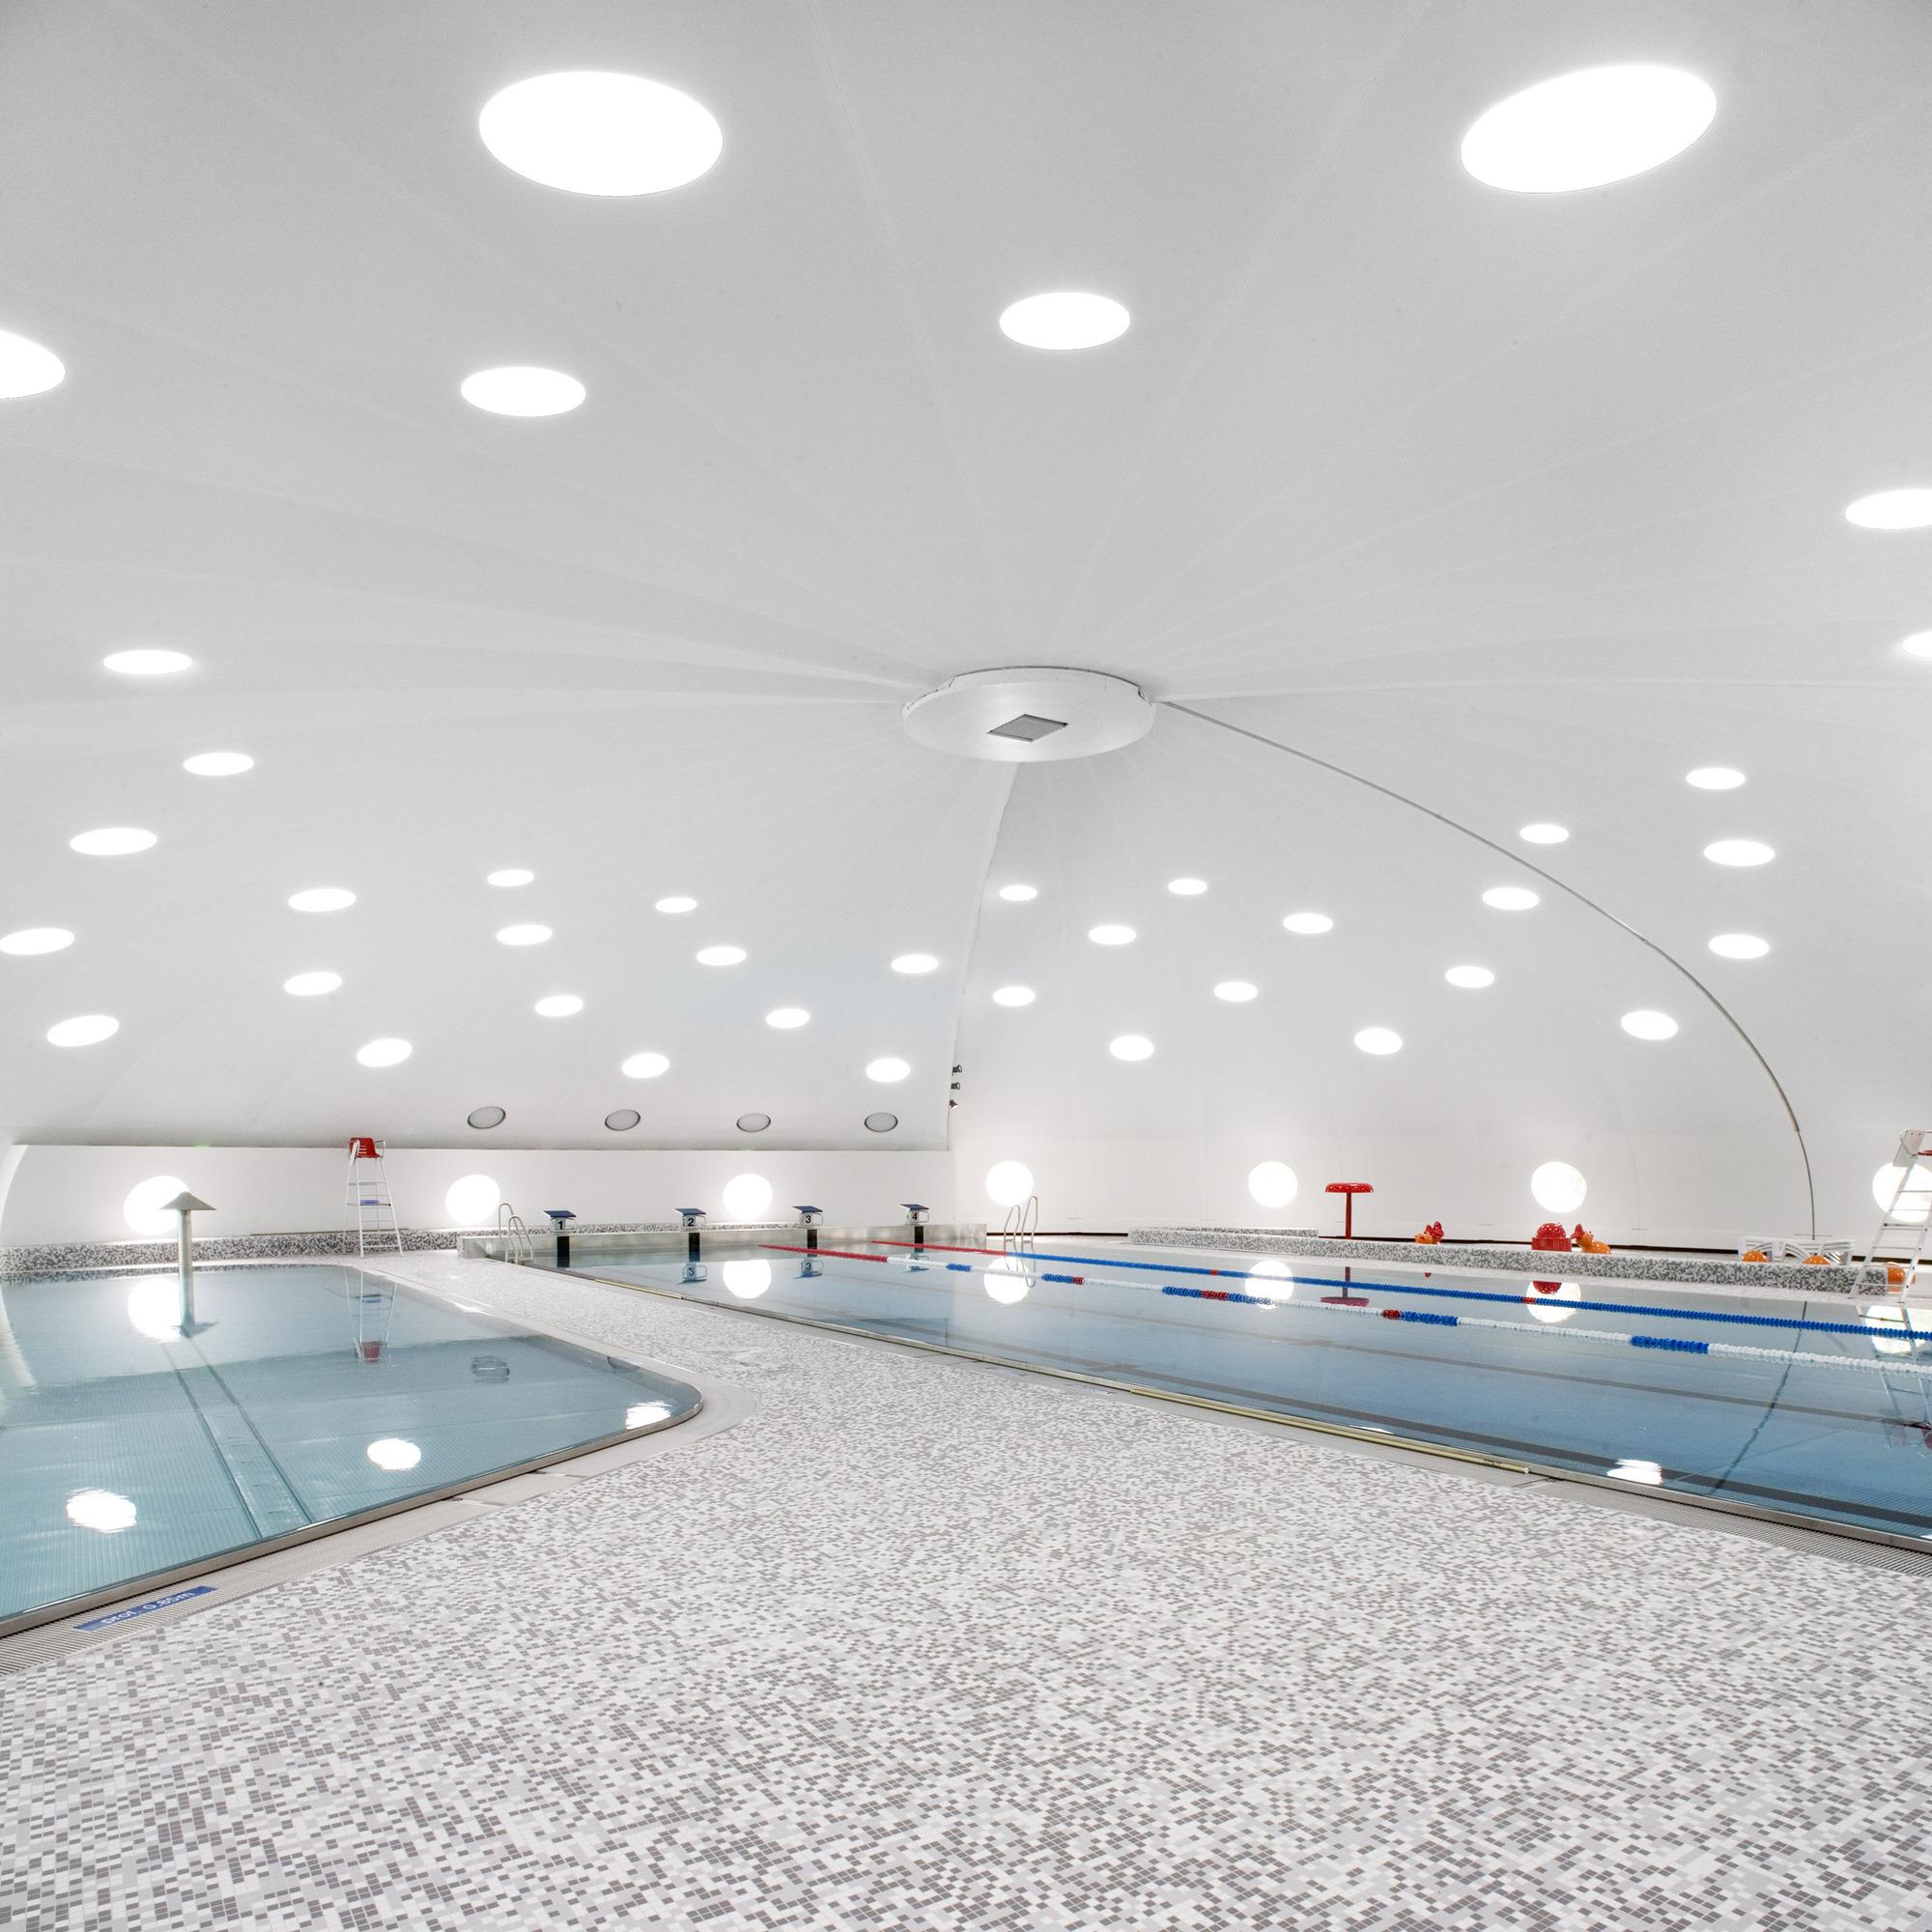 54dc1398e58ece96bb000089_-tournesol-swimming-pool-refurbishment-urbane-kultur_07